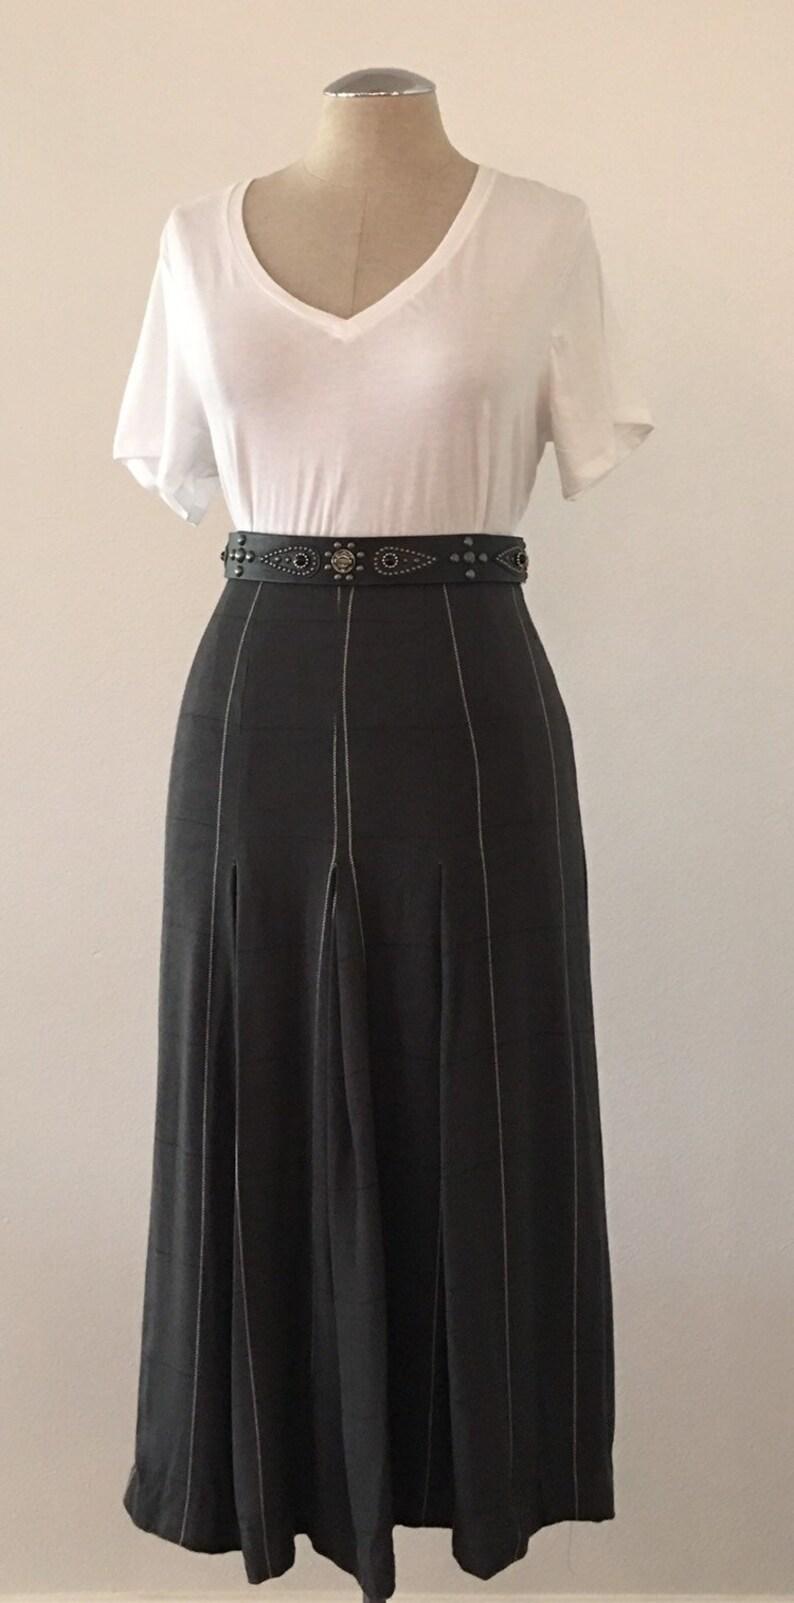 8aea085b63b Vintage Charcoal Gray Windowpane Skirt Graphite Grey 28 | Etsy